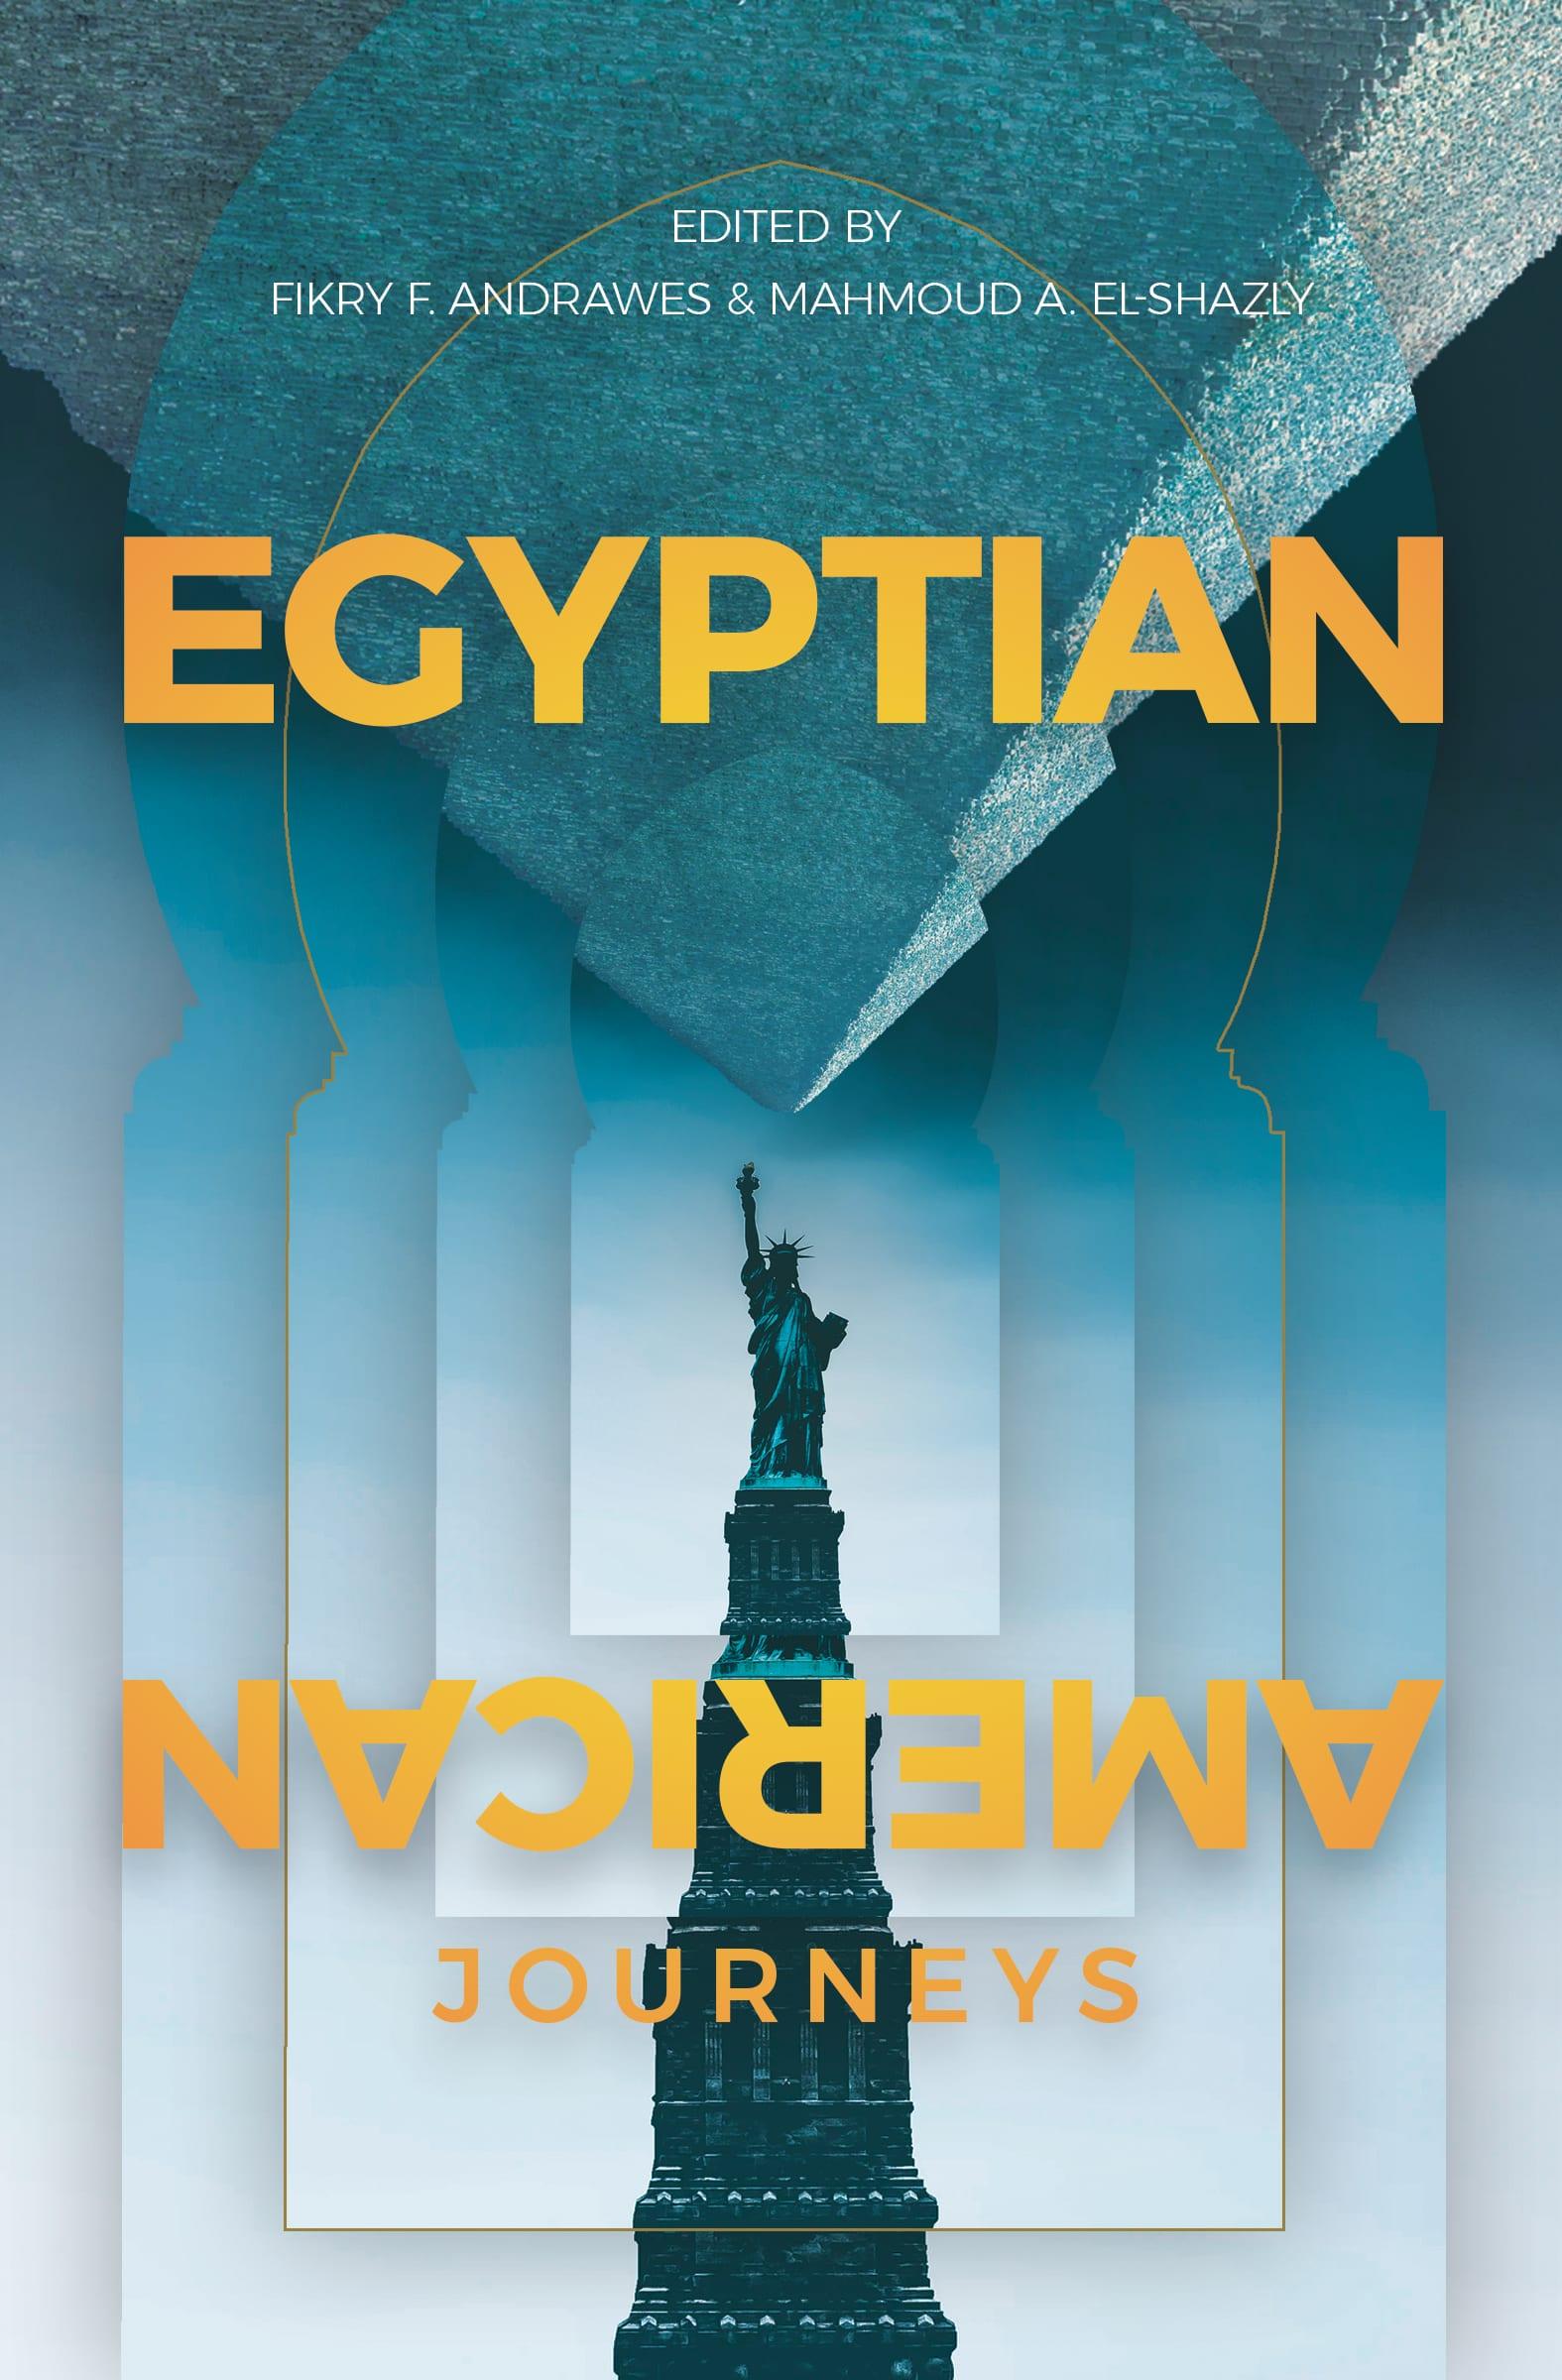 Egyptian-American Journeys